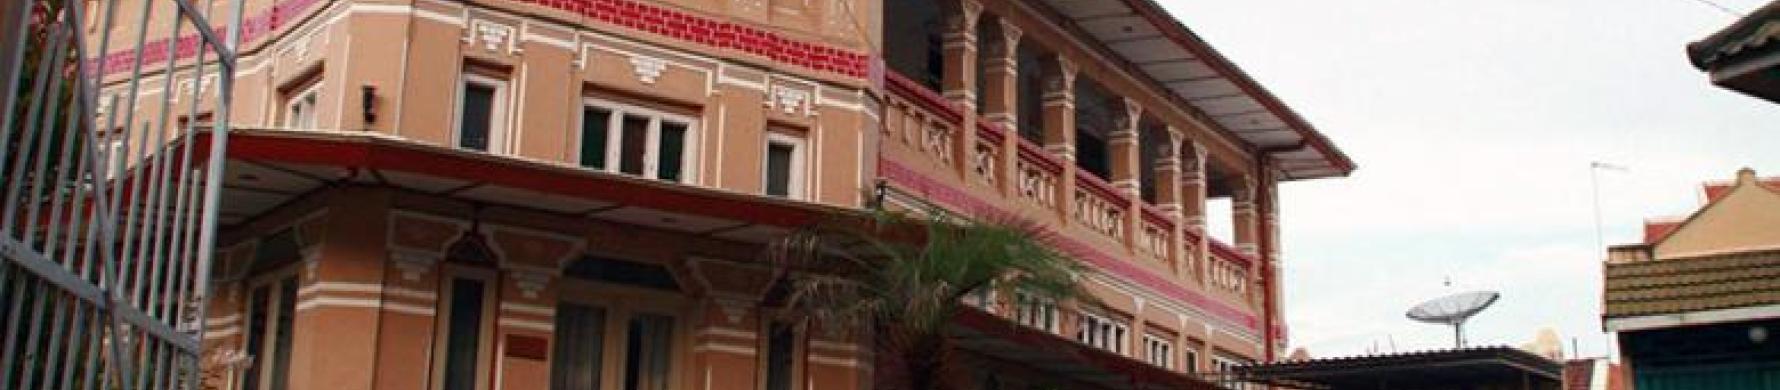 Rumah Gajah Mungkur Jadi Ikon Kampung Kemasan Gresik Darwin Chai